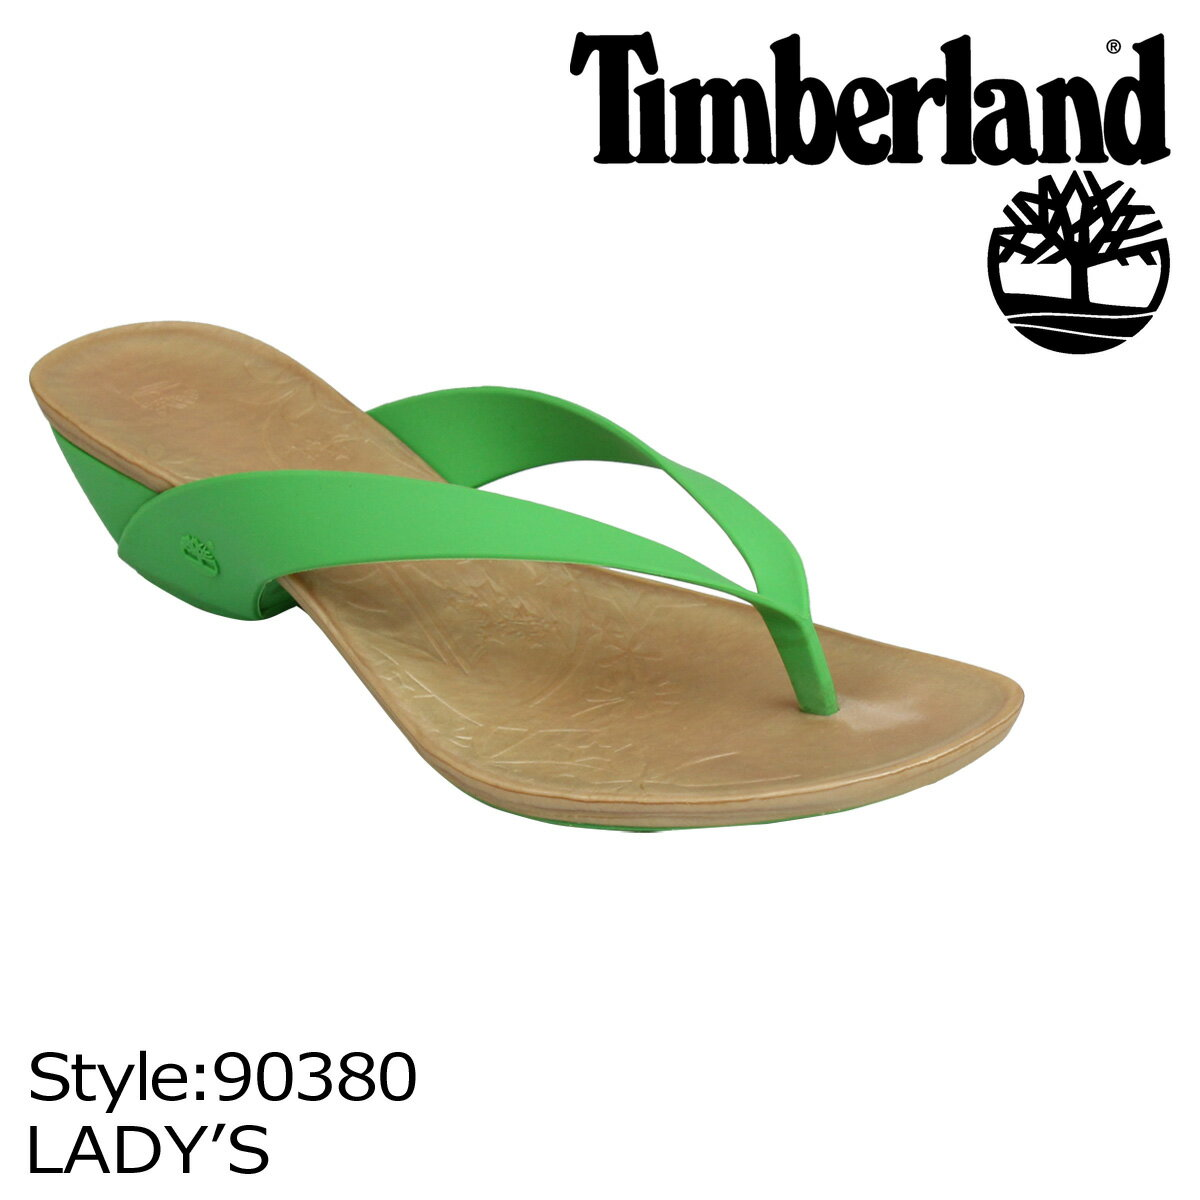 Timberland ティンバーランド レディース WOMEN'S FLIRTATIOUS THONG サンダル トングサンダル 90380 グリーン 【9000足】